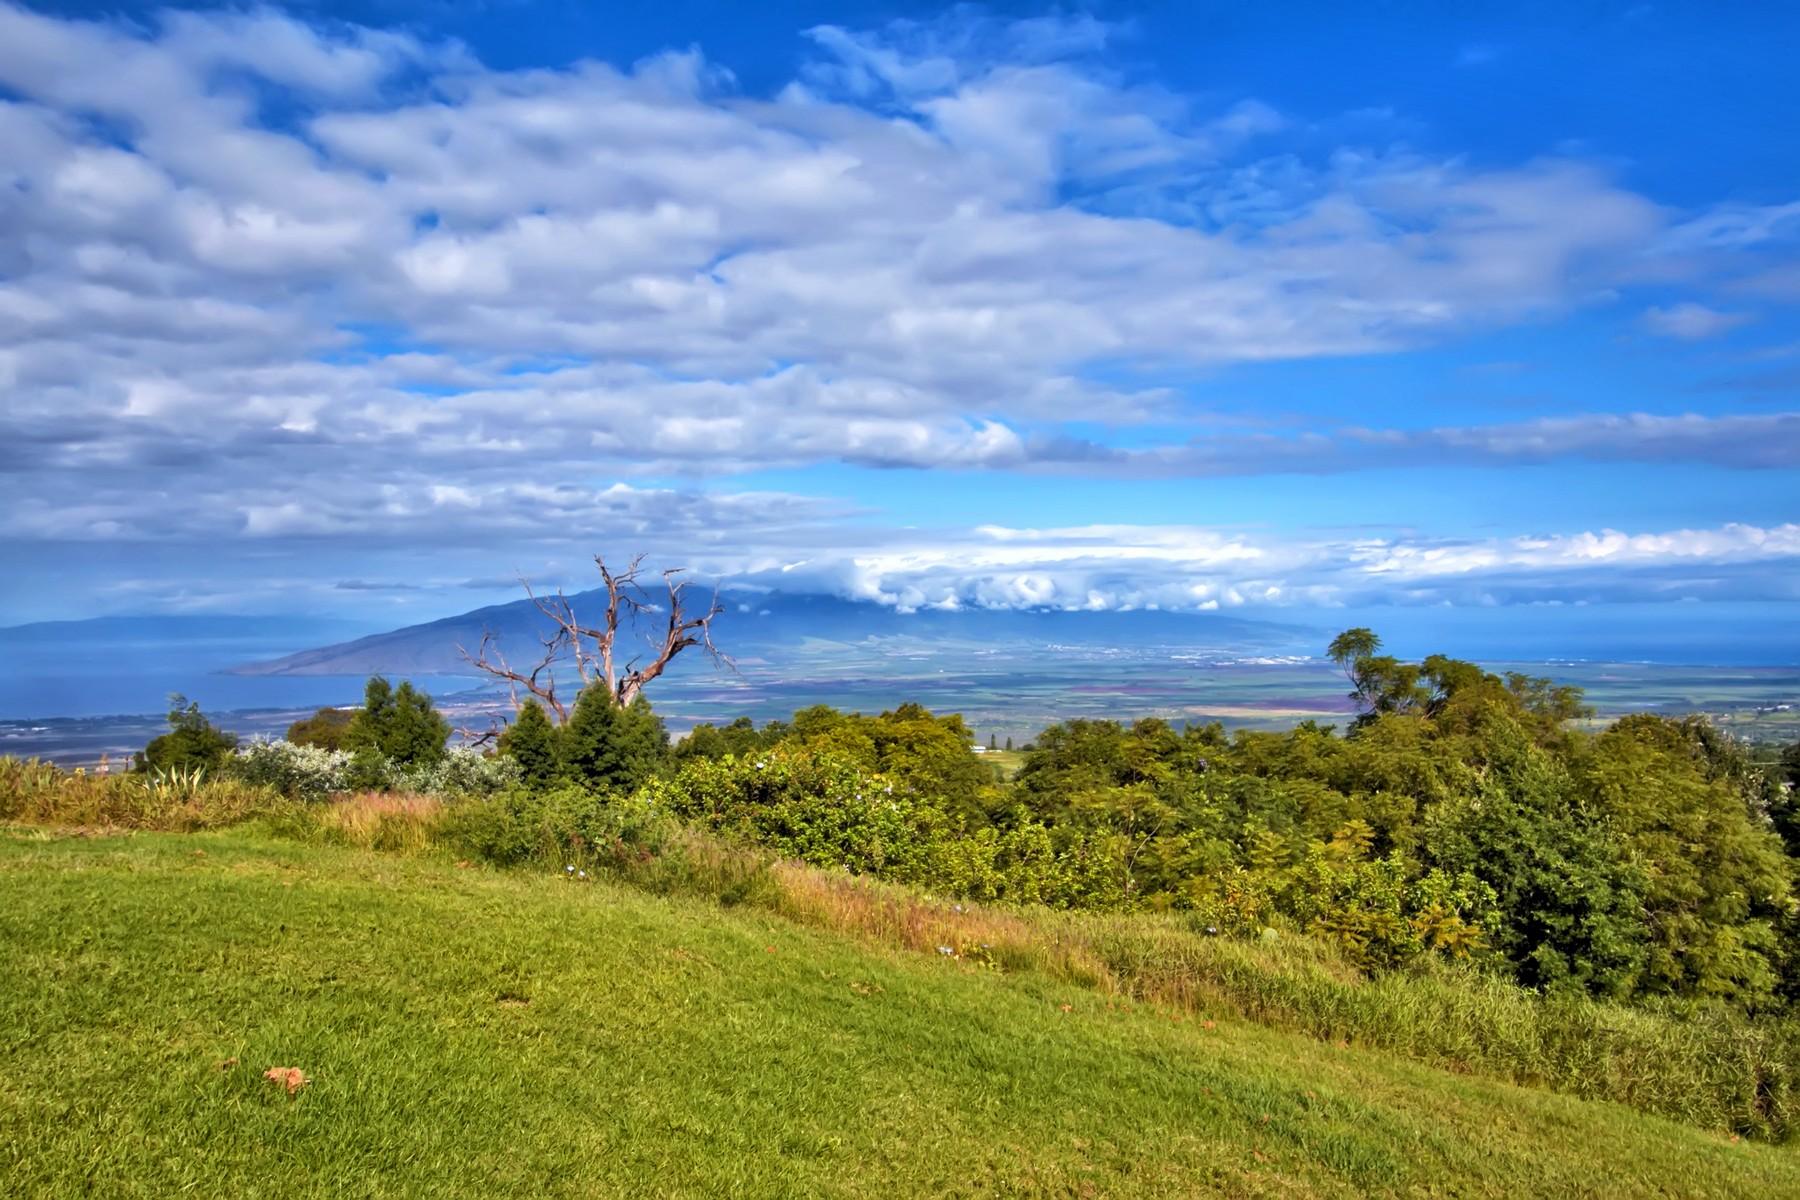 Single Family Home for Sale at Embrace Maui's Natural Beauty From 2.77 Acres On The Slopes of Haleakala 22 Malia-Iokepa Place Kula, Hawaii, 96790 United States